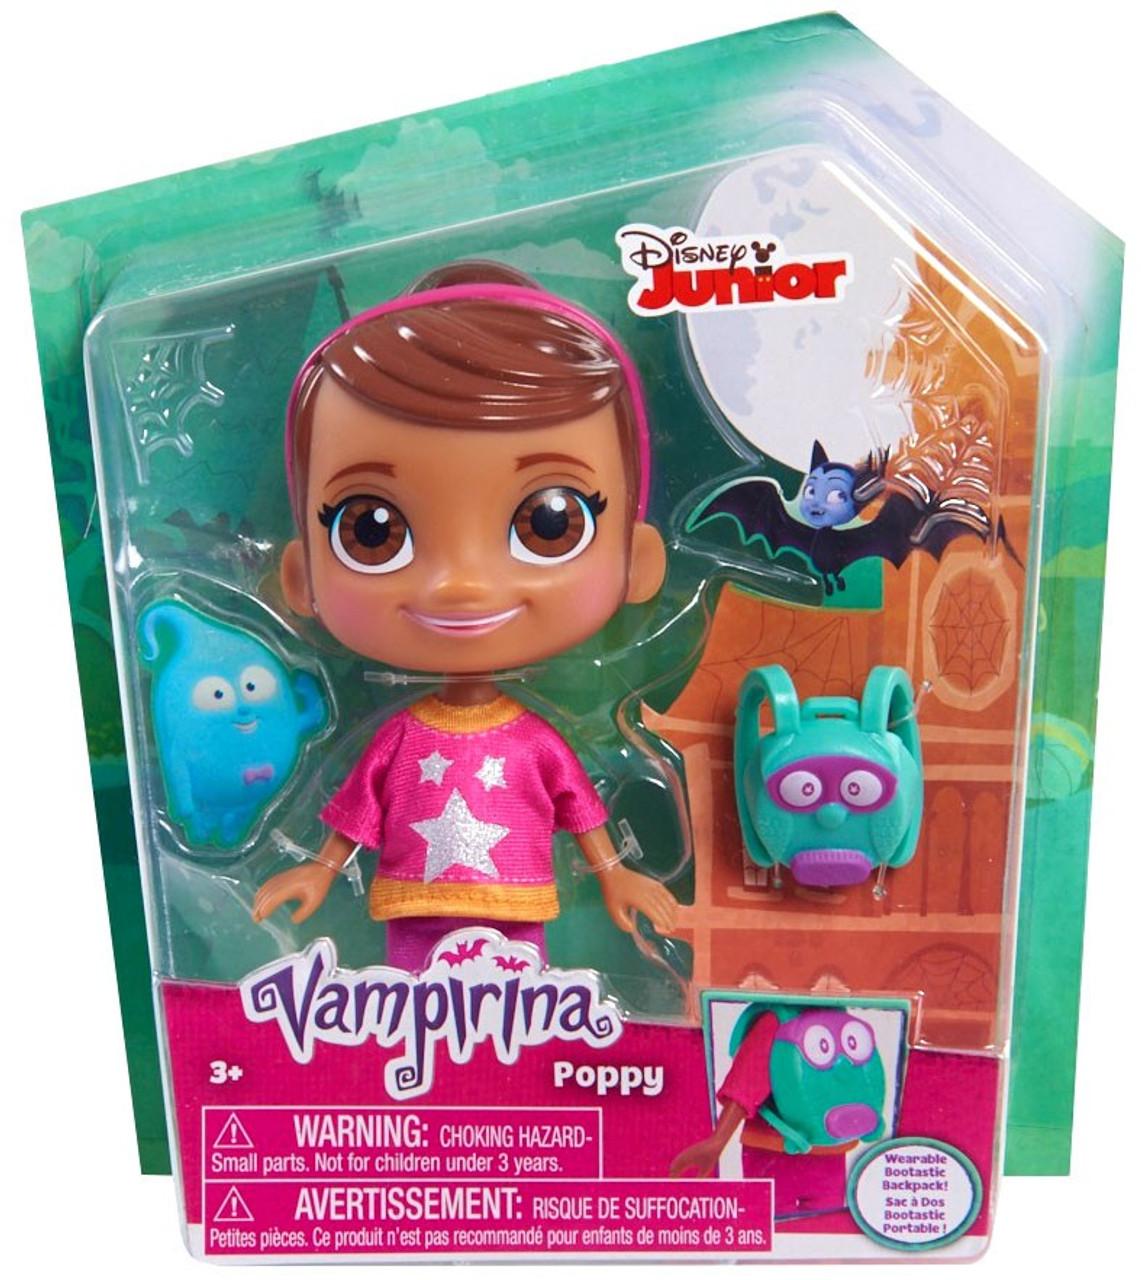 94a95870987 Disney Junior Vampirina Poppy Figure Damaged Package Just Play - ToyWiz